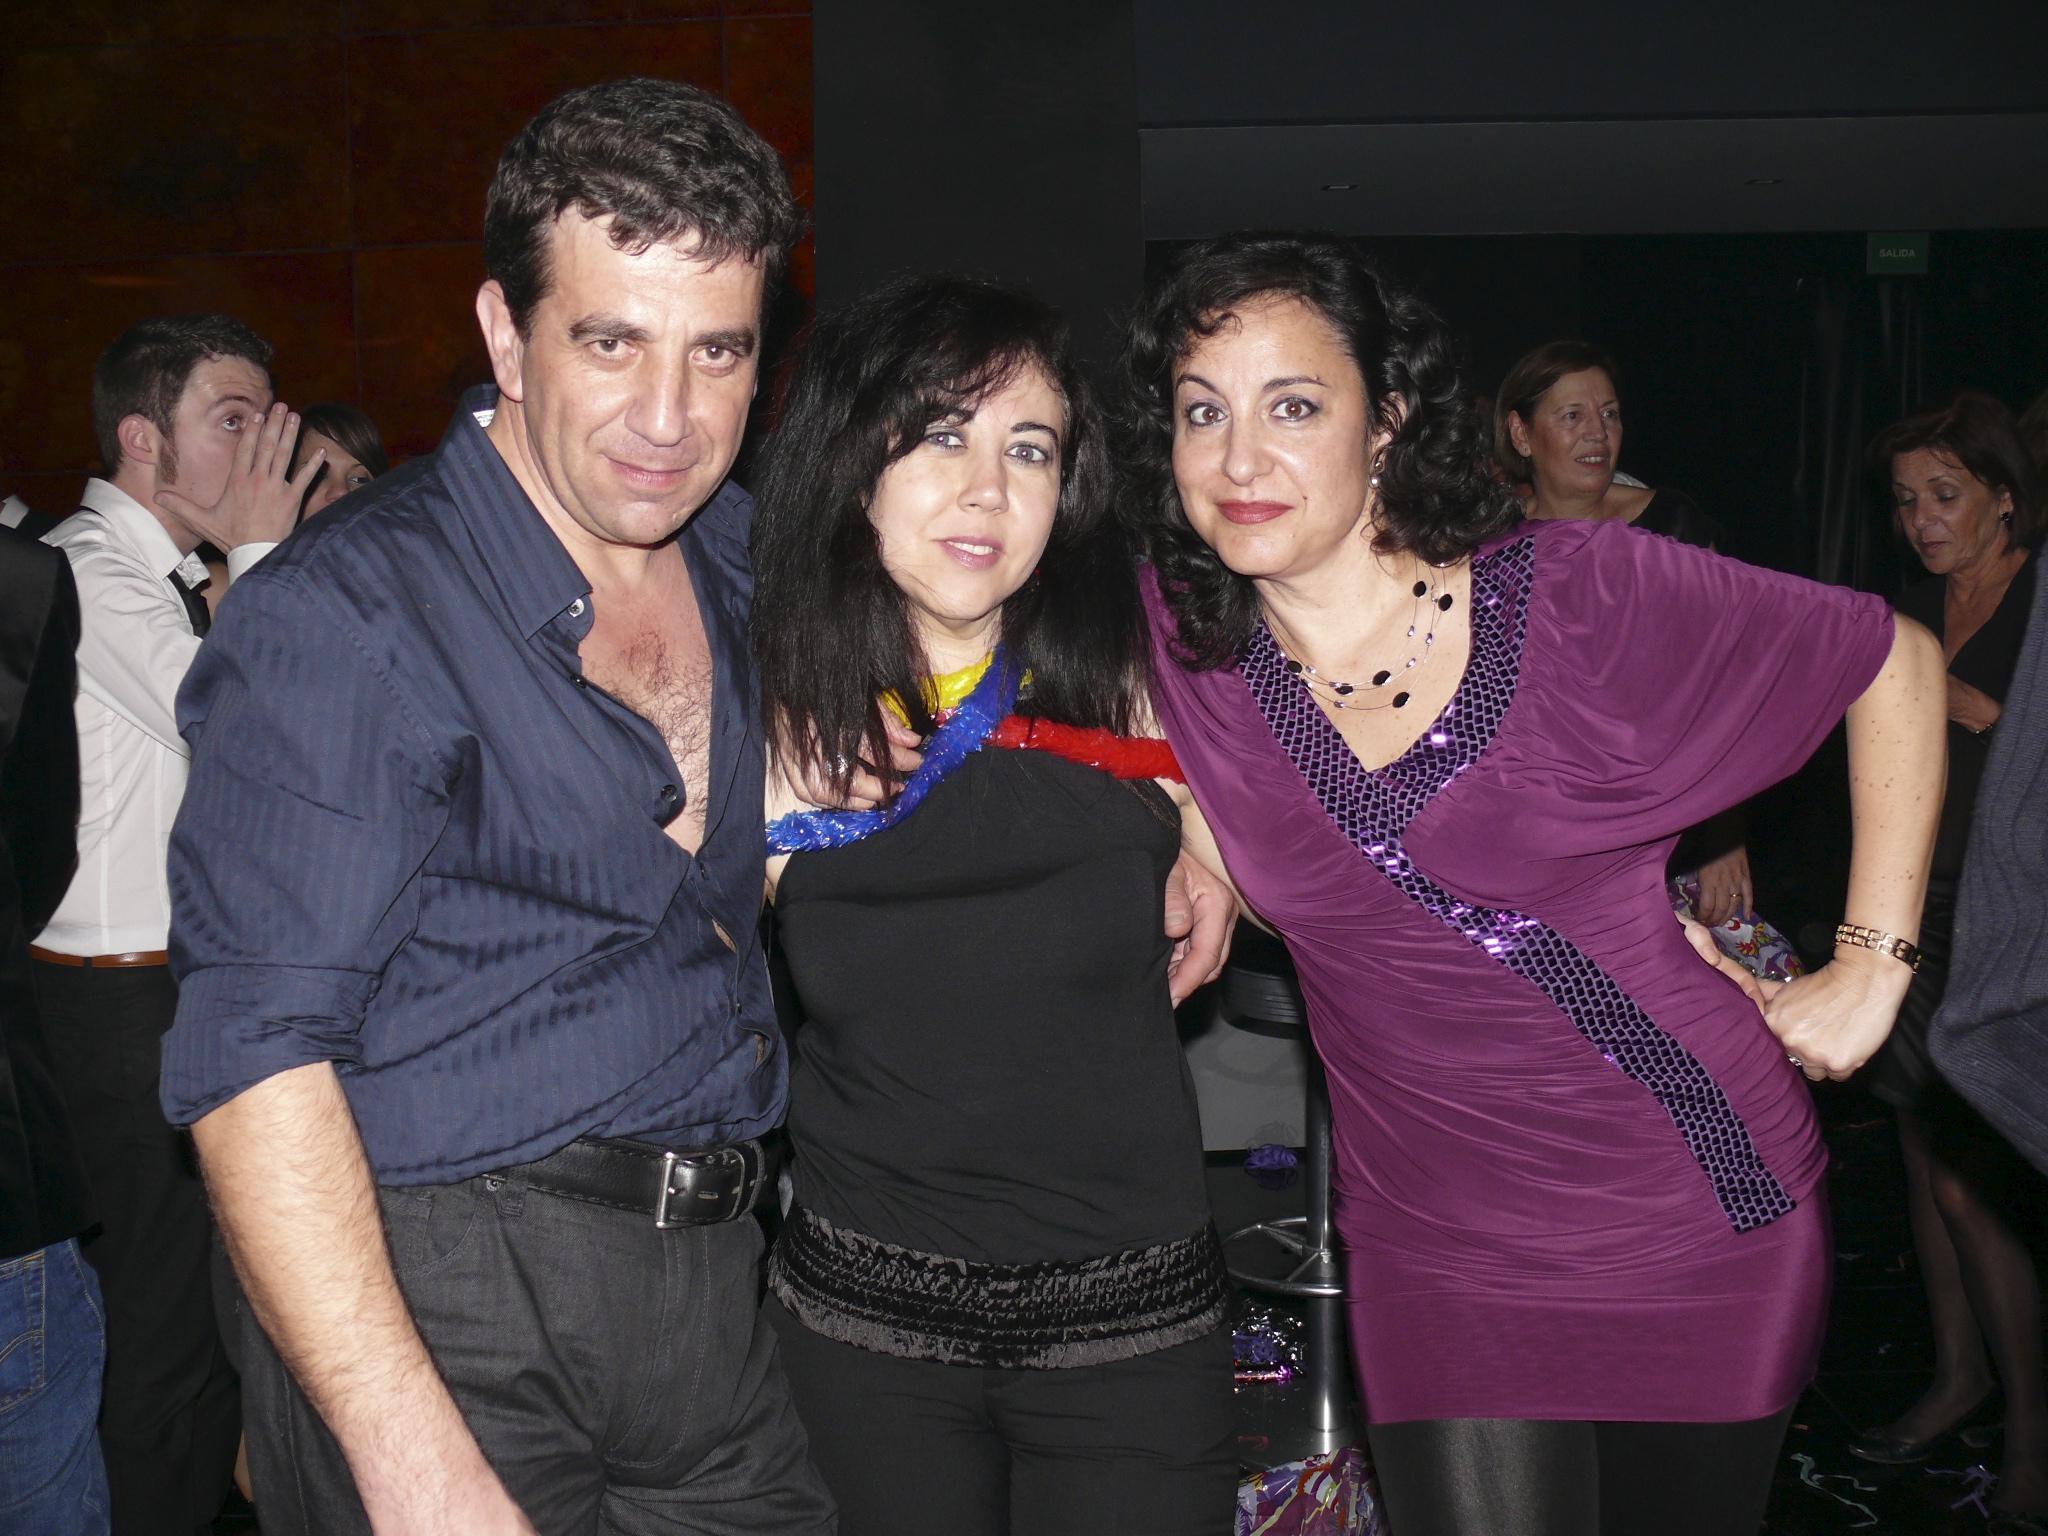 https://ultimahora.es/vips/fiestas/2010/01/02/24/feliz-2010.html 2010 ...